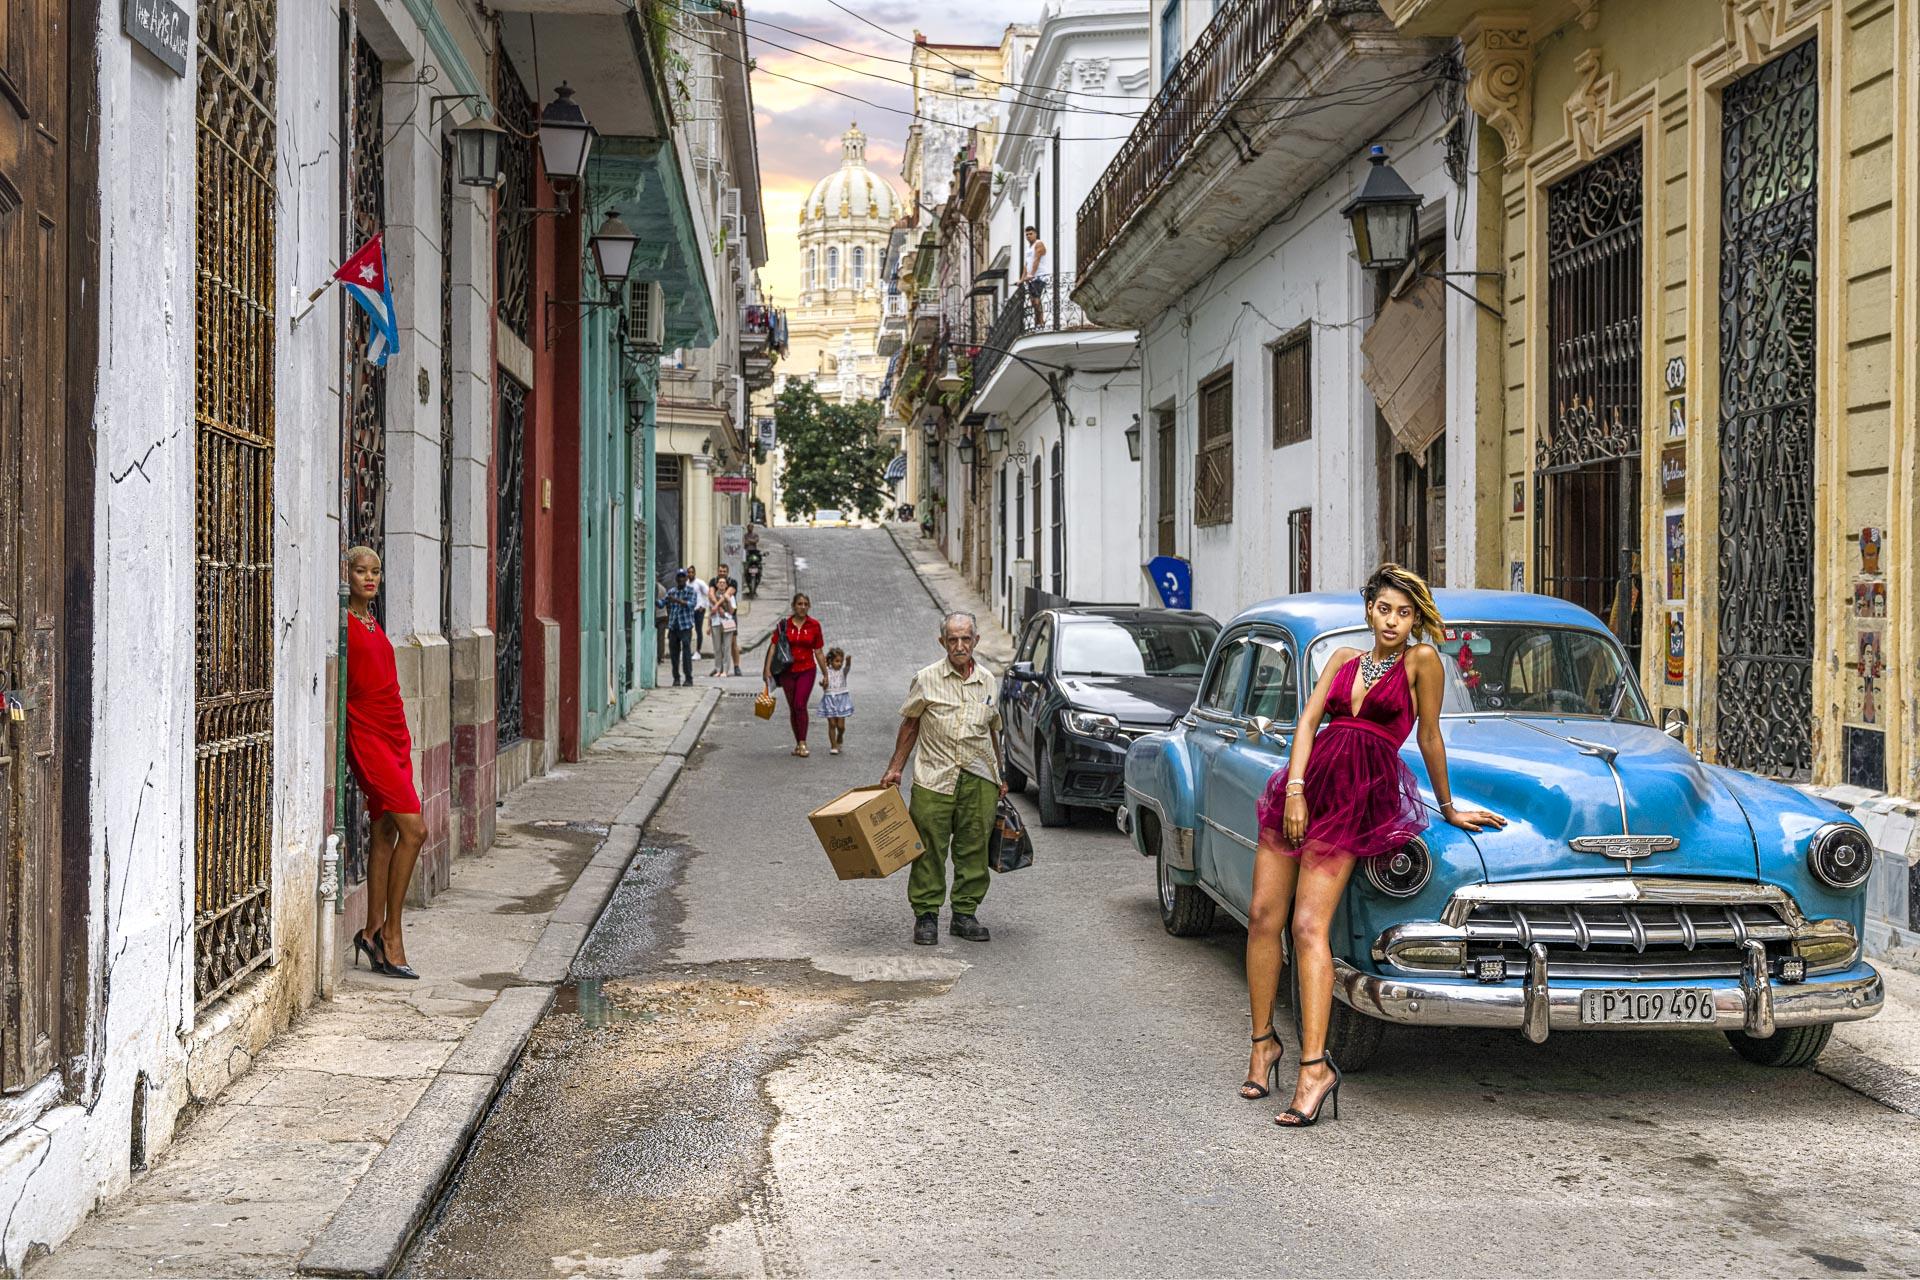 fotoreise-fotosafari-hd-2021-078-Kuba